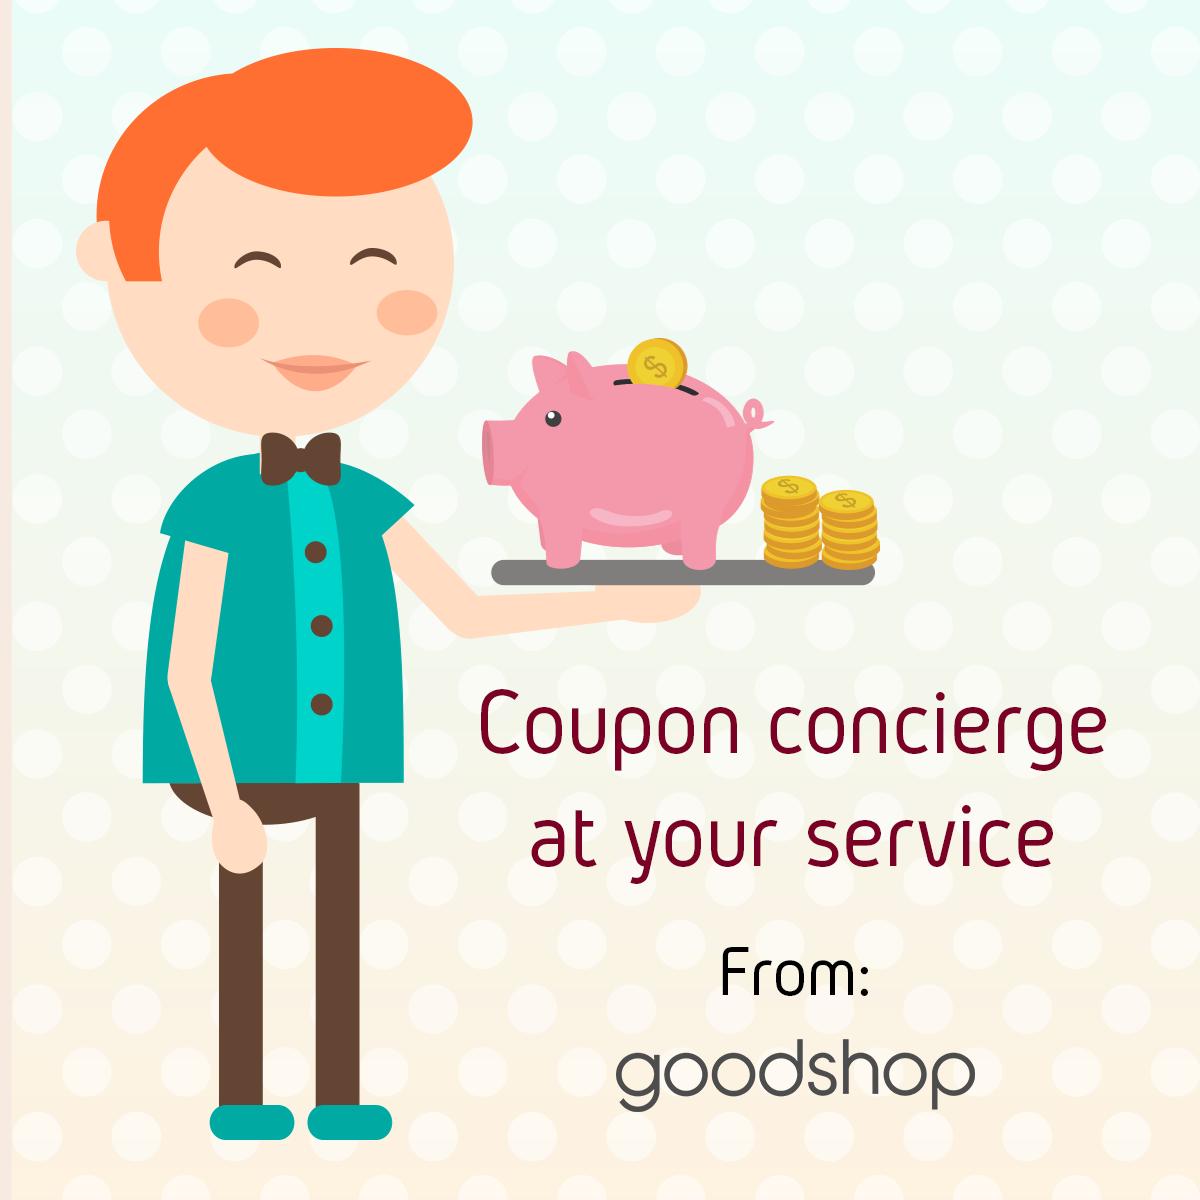 concierge-facebook-1200x1200-01.png